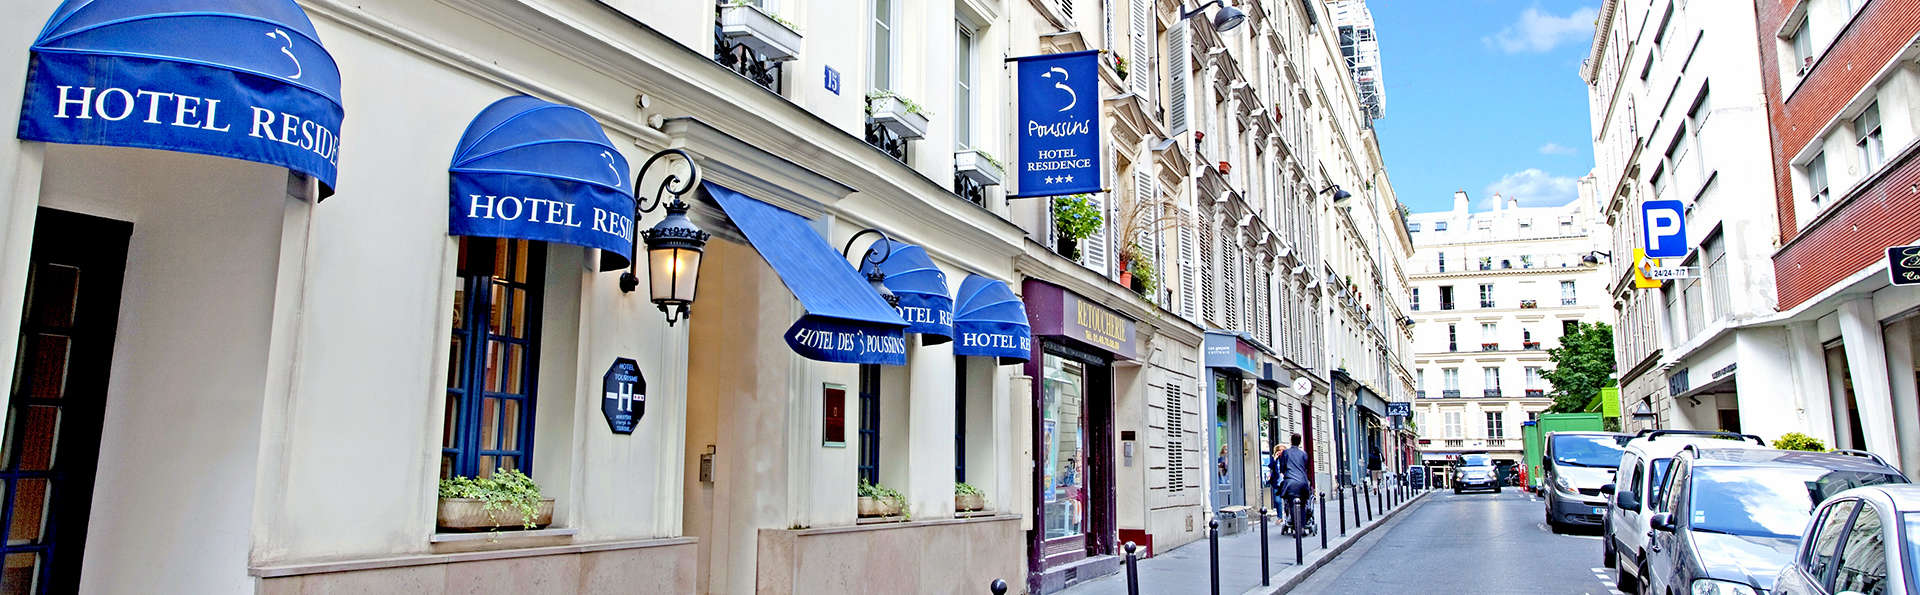 Hôtel des 3 Poussins - EDIT_Fachada_2.jpg